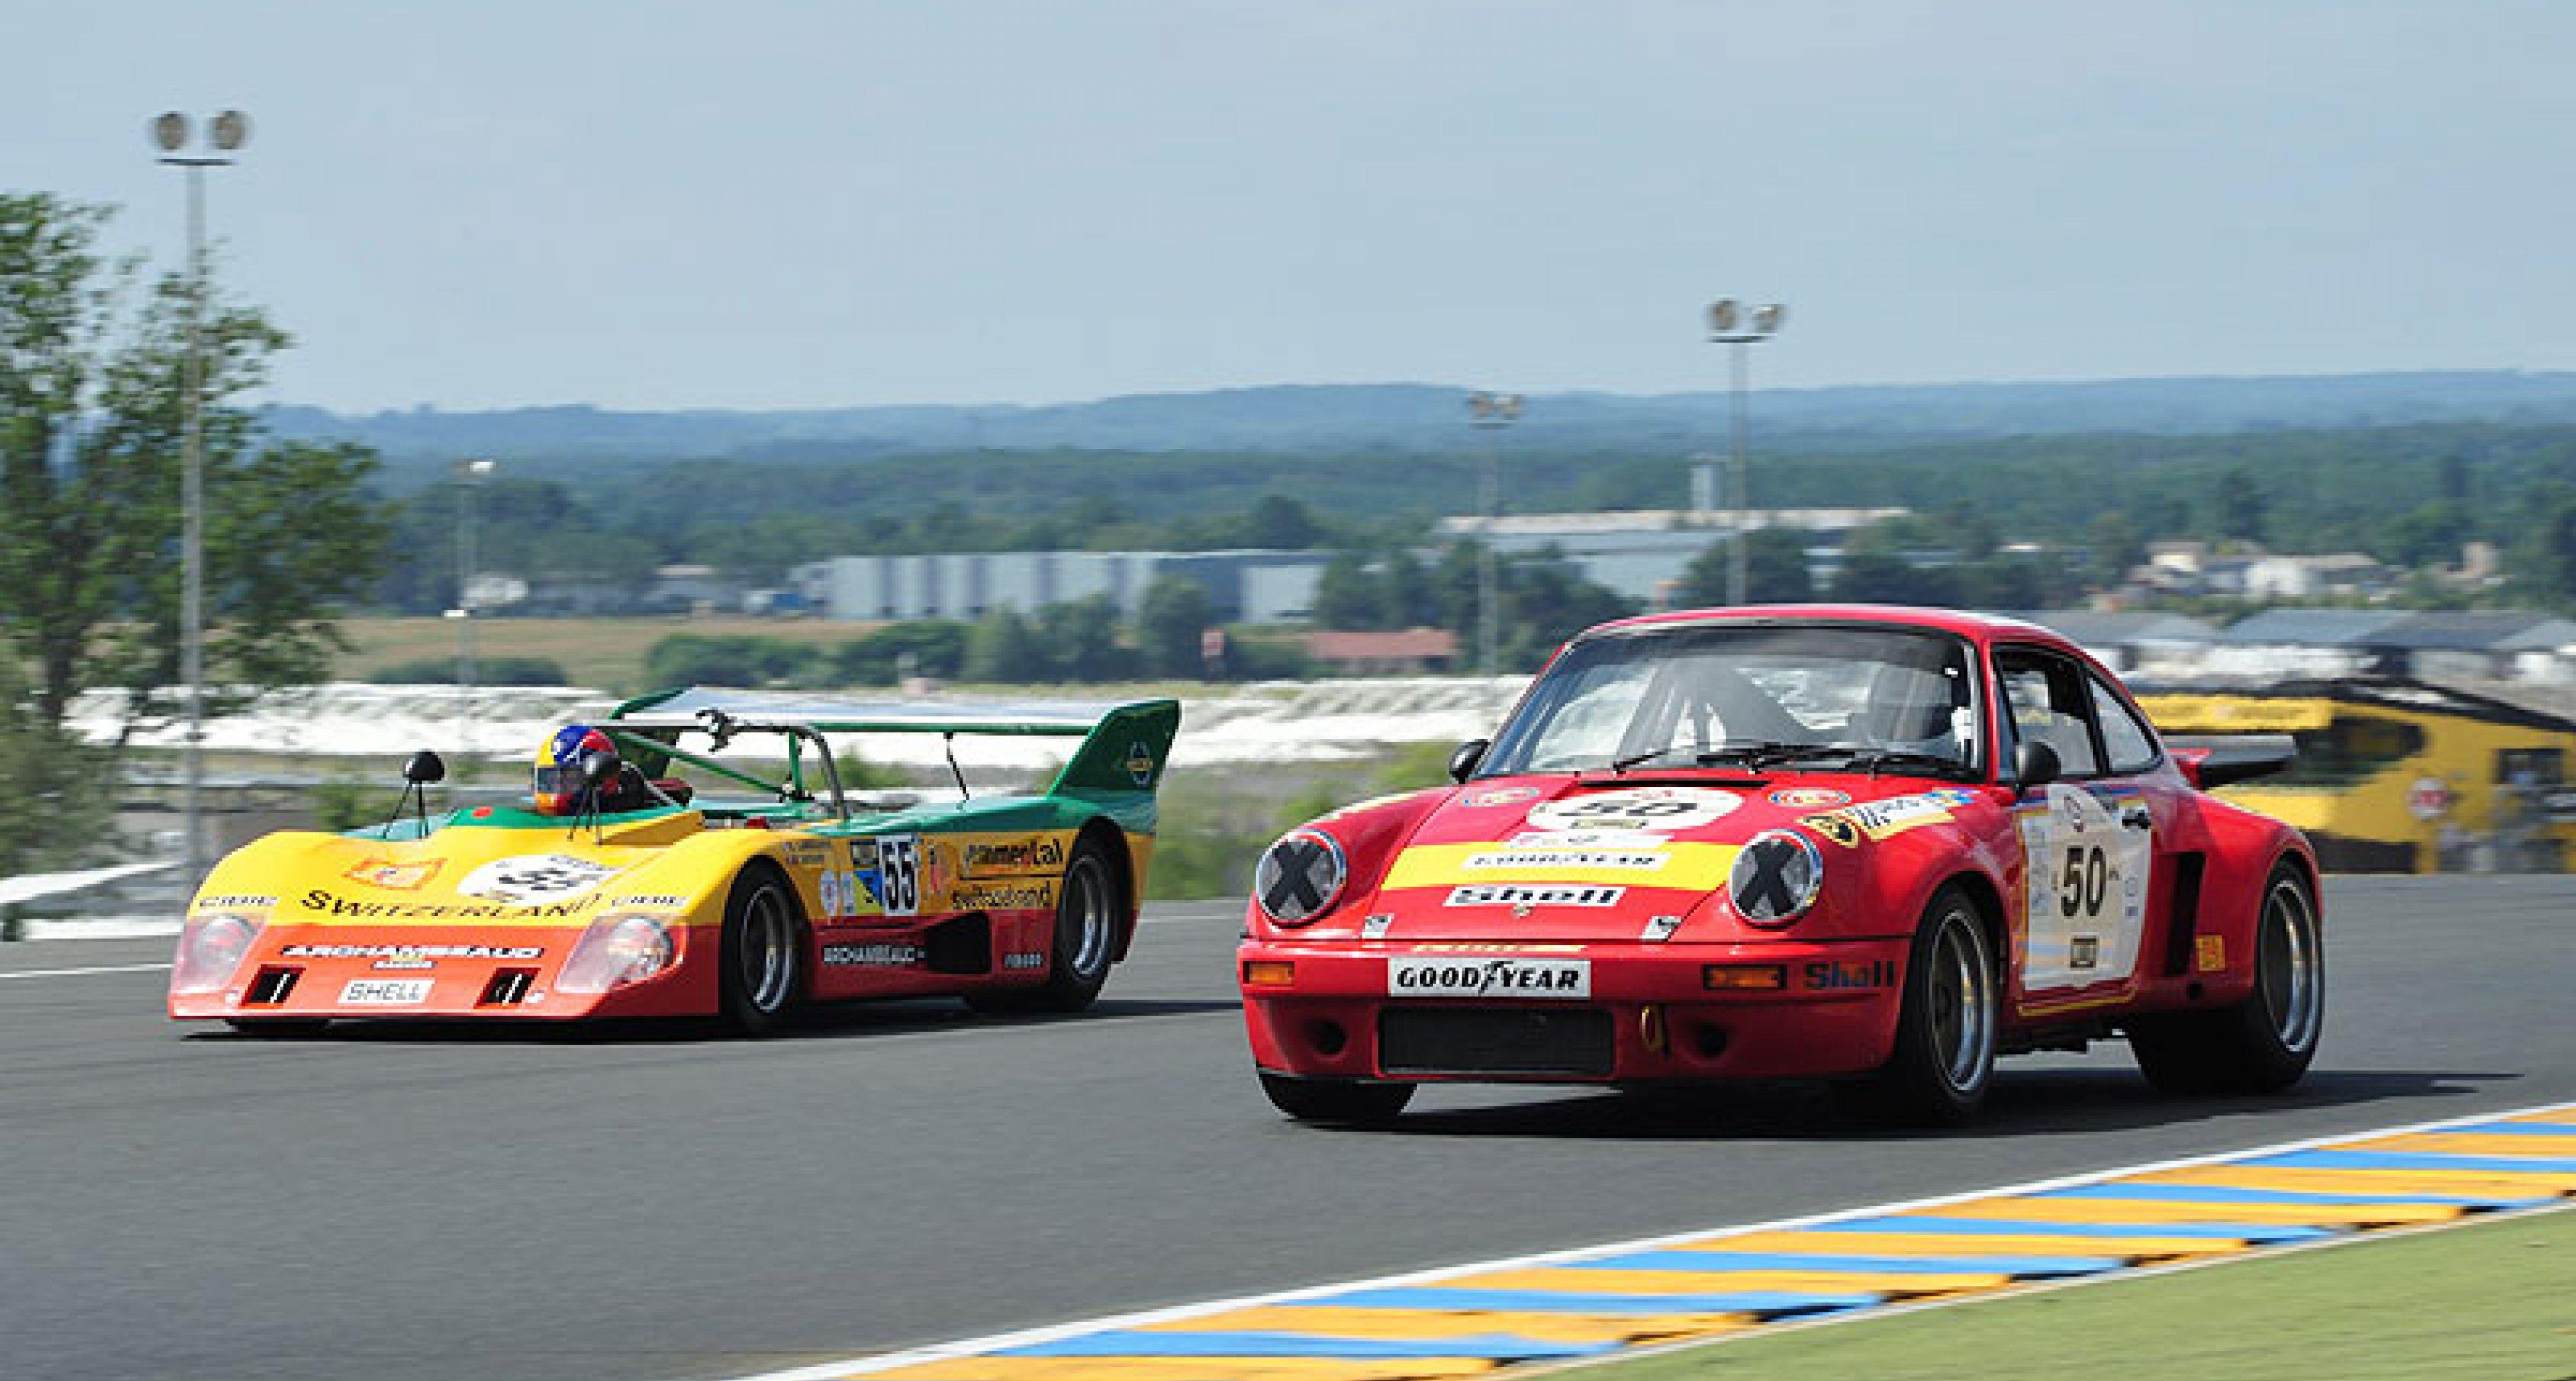 Le Mans Classic 2010: Die rasenden Gentlemen